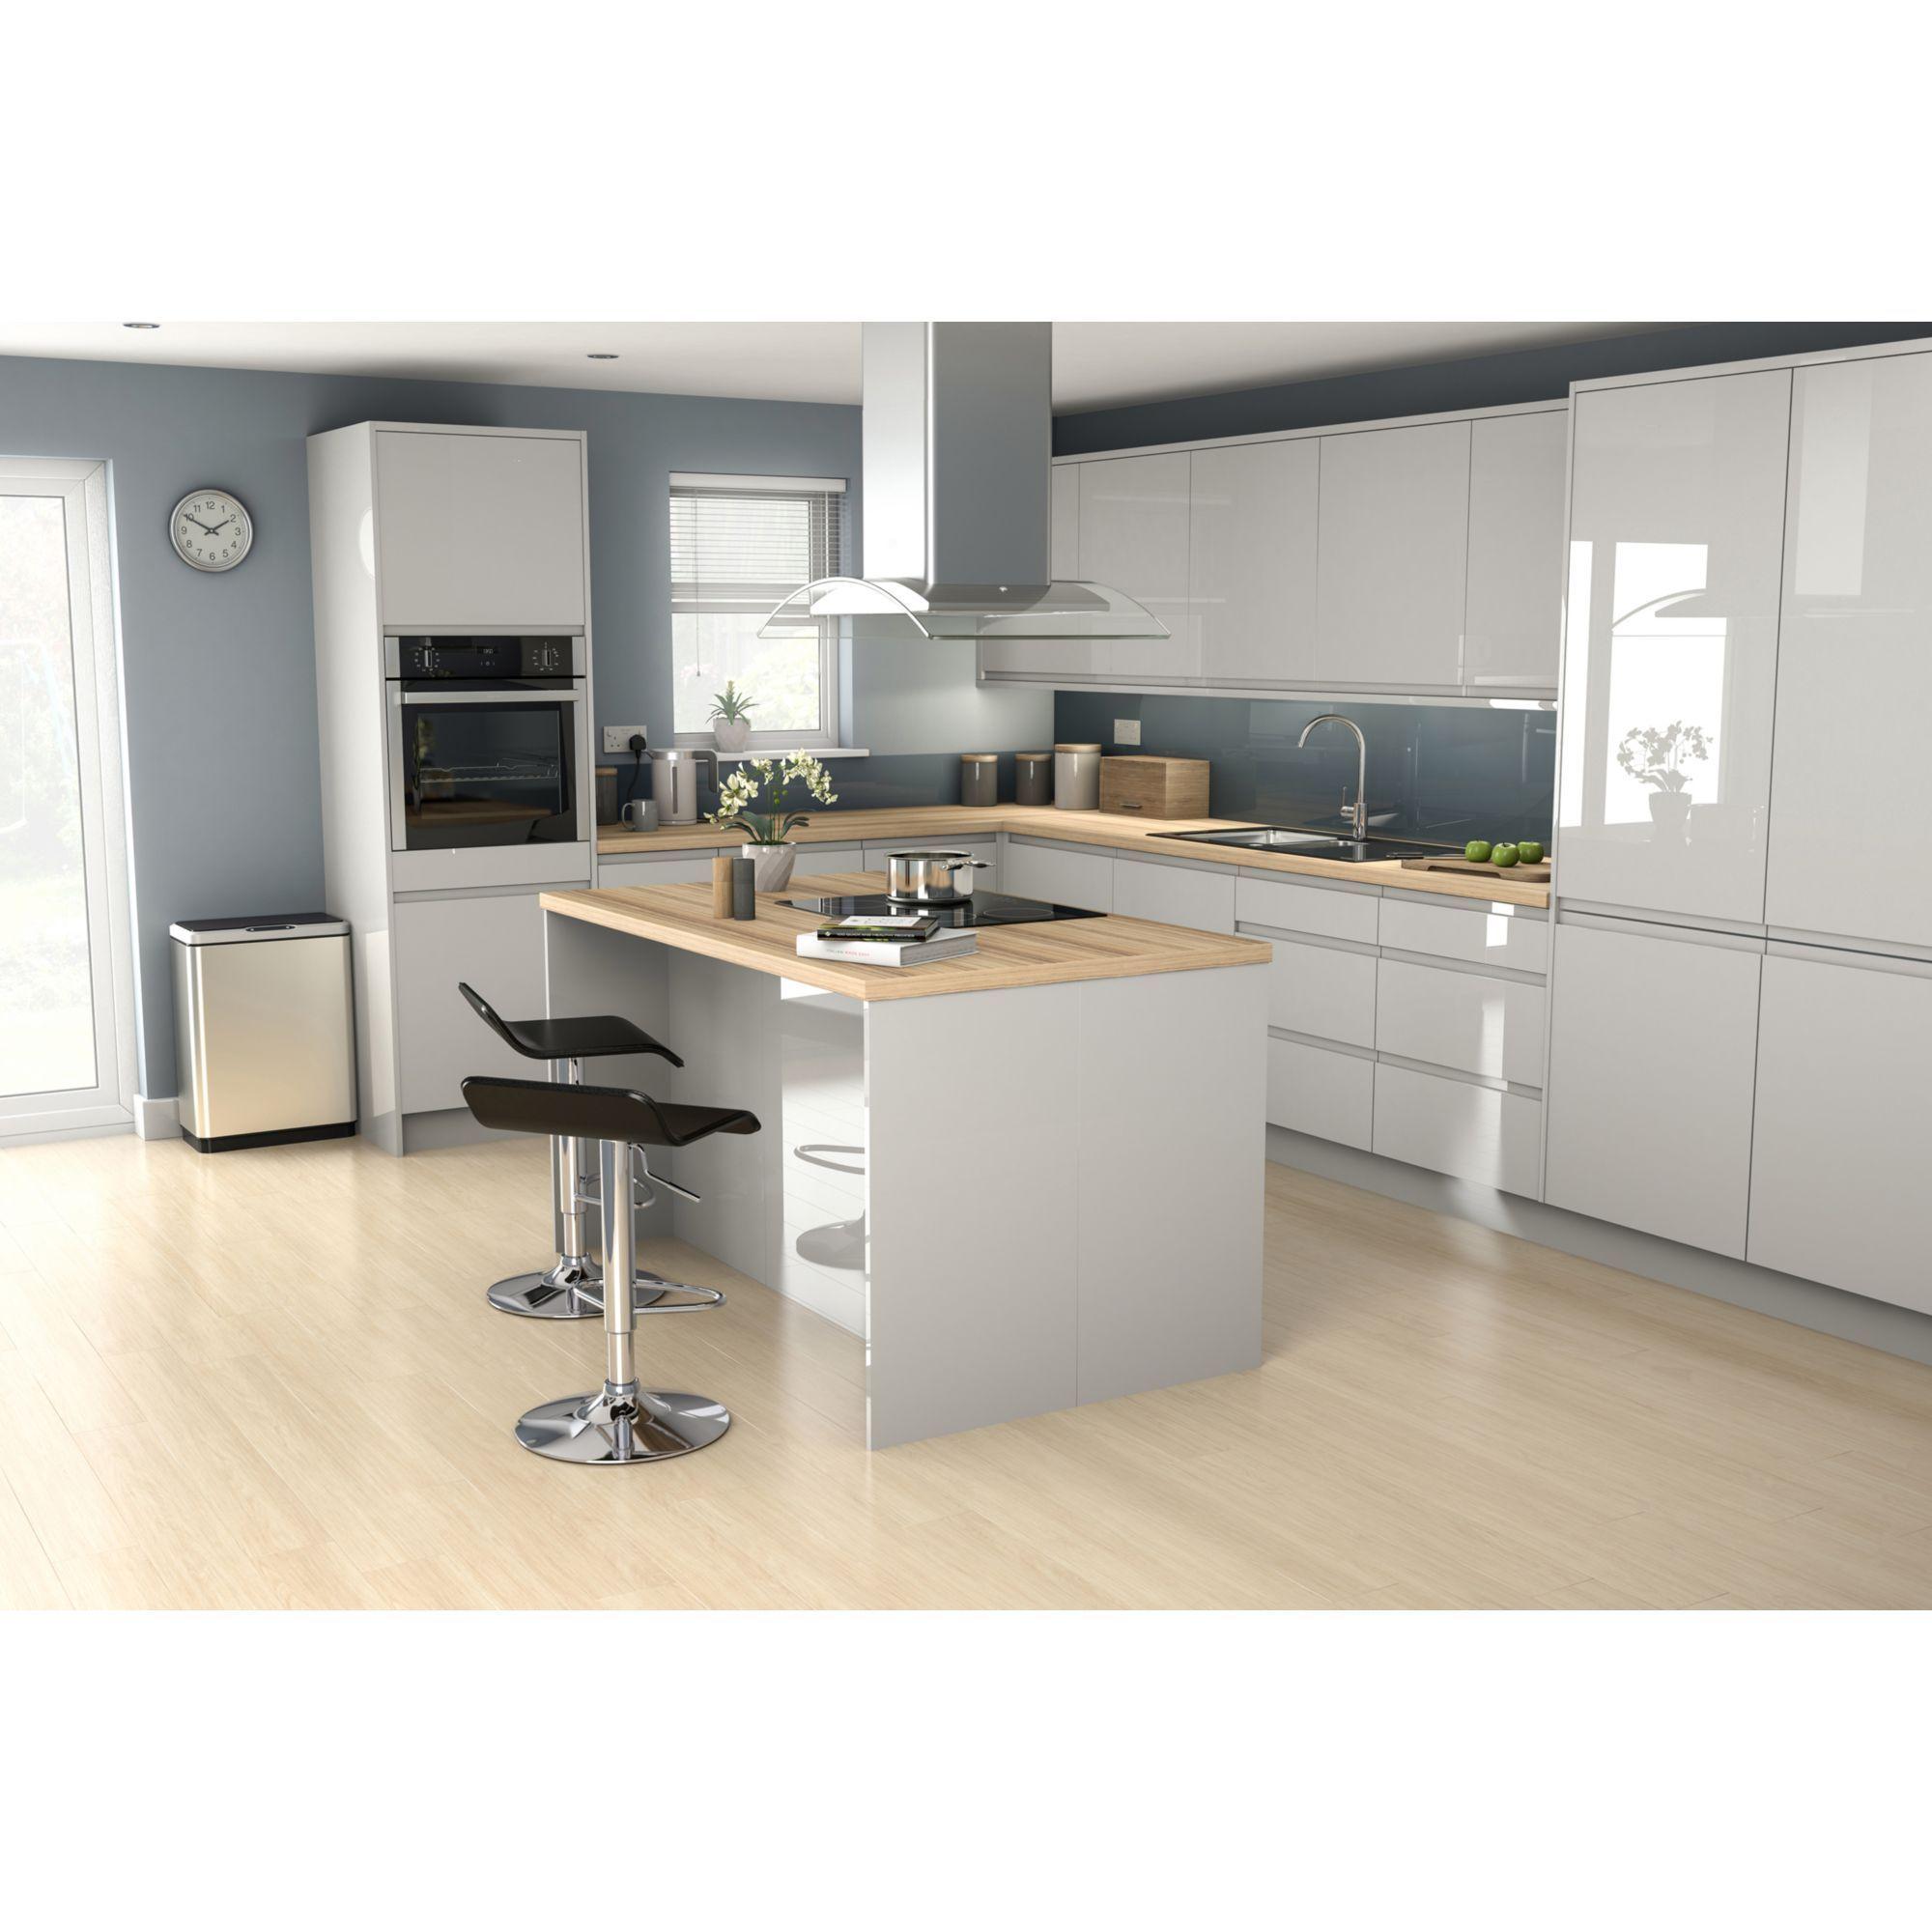 It Kitchens Marletti Gloss Dove Grey Cabinet Door W 250mm Pack Of 2 Diy At B Q Grey Cabinets Kitchen Design Laminate Worktop